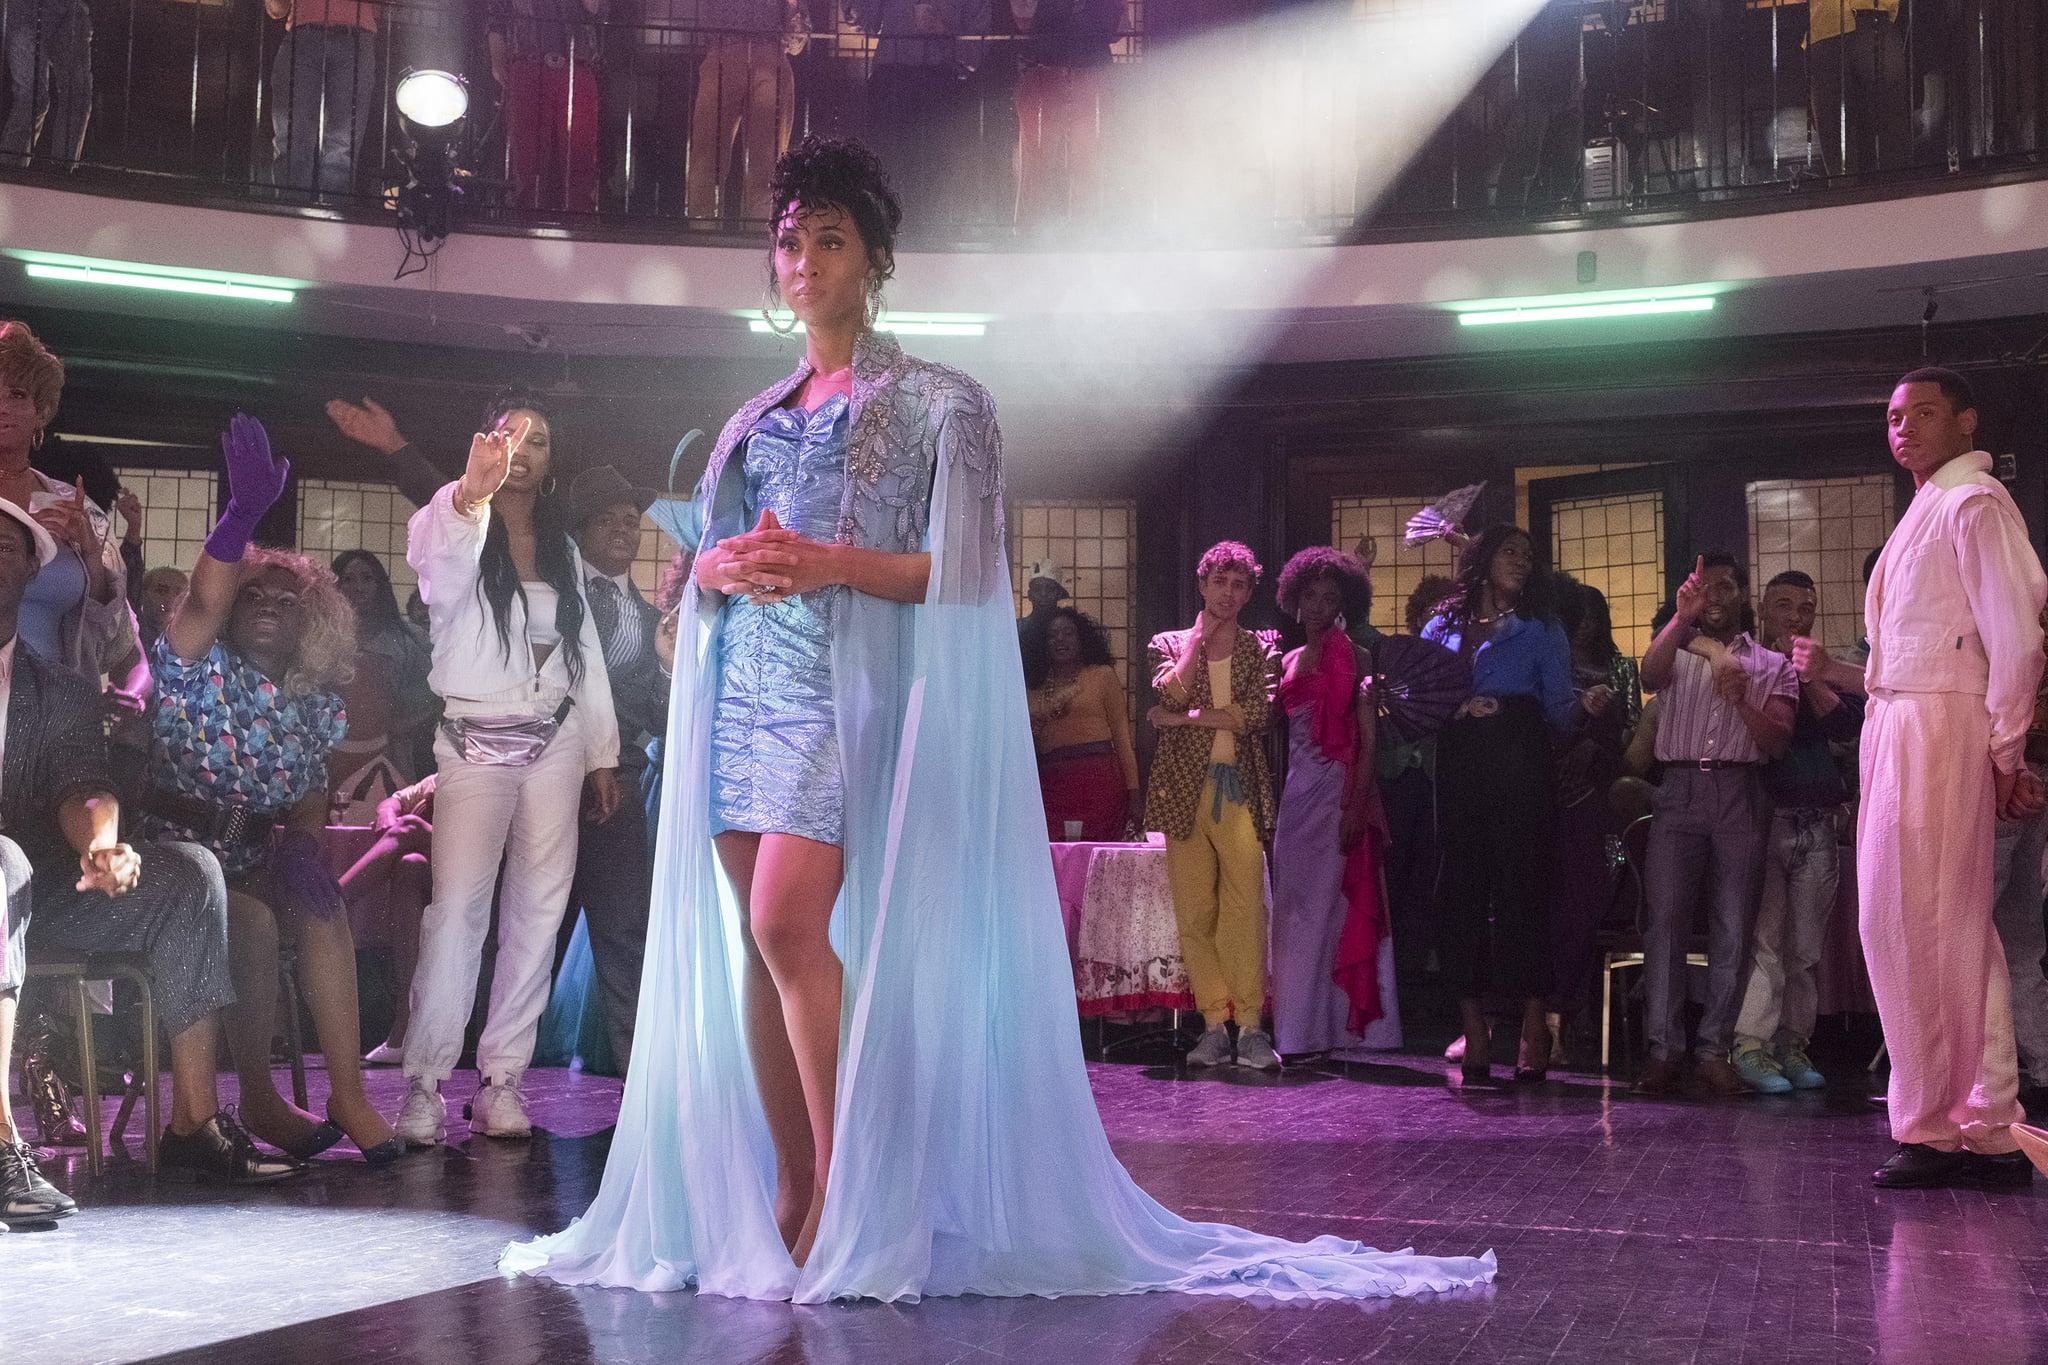 Interview With Pose Costume Designer Analucia McGorty